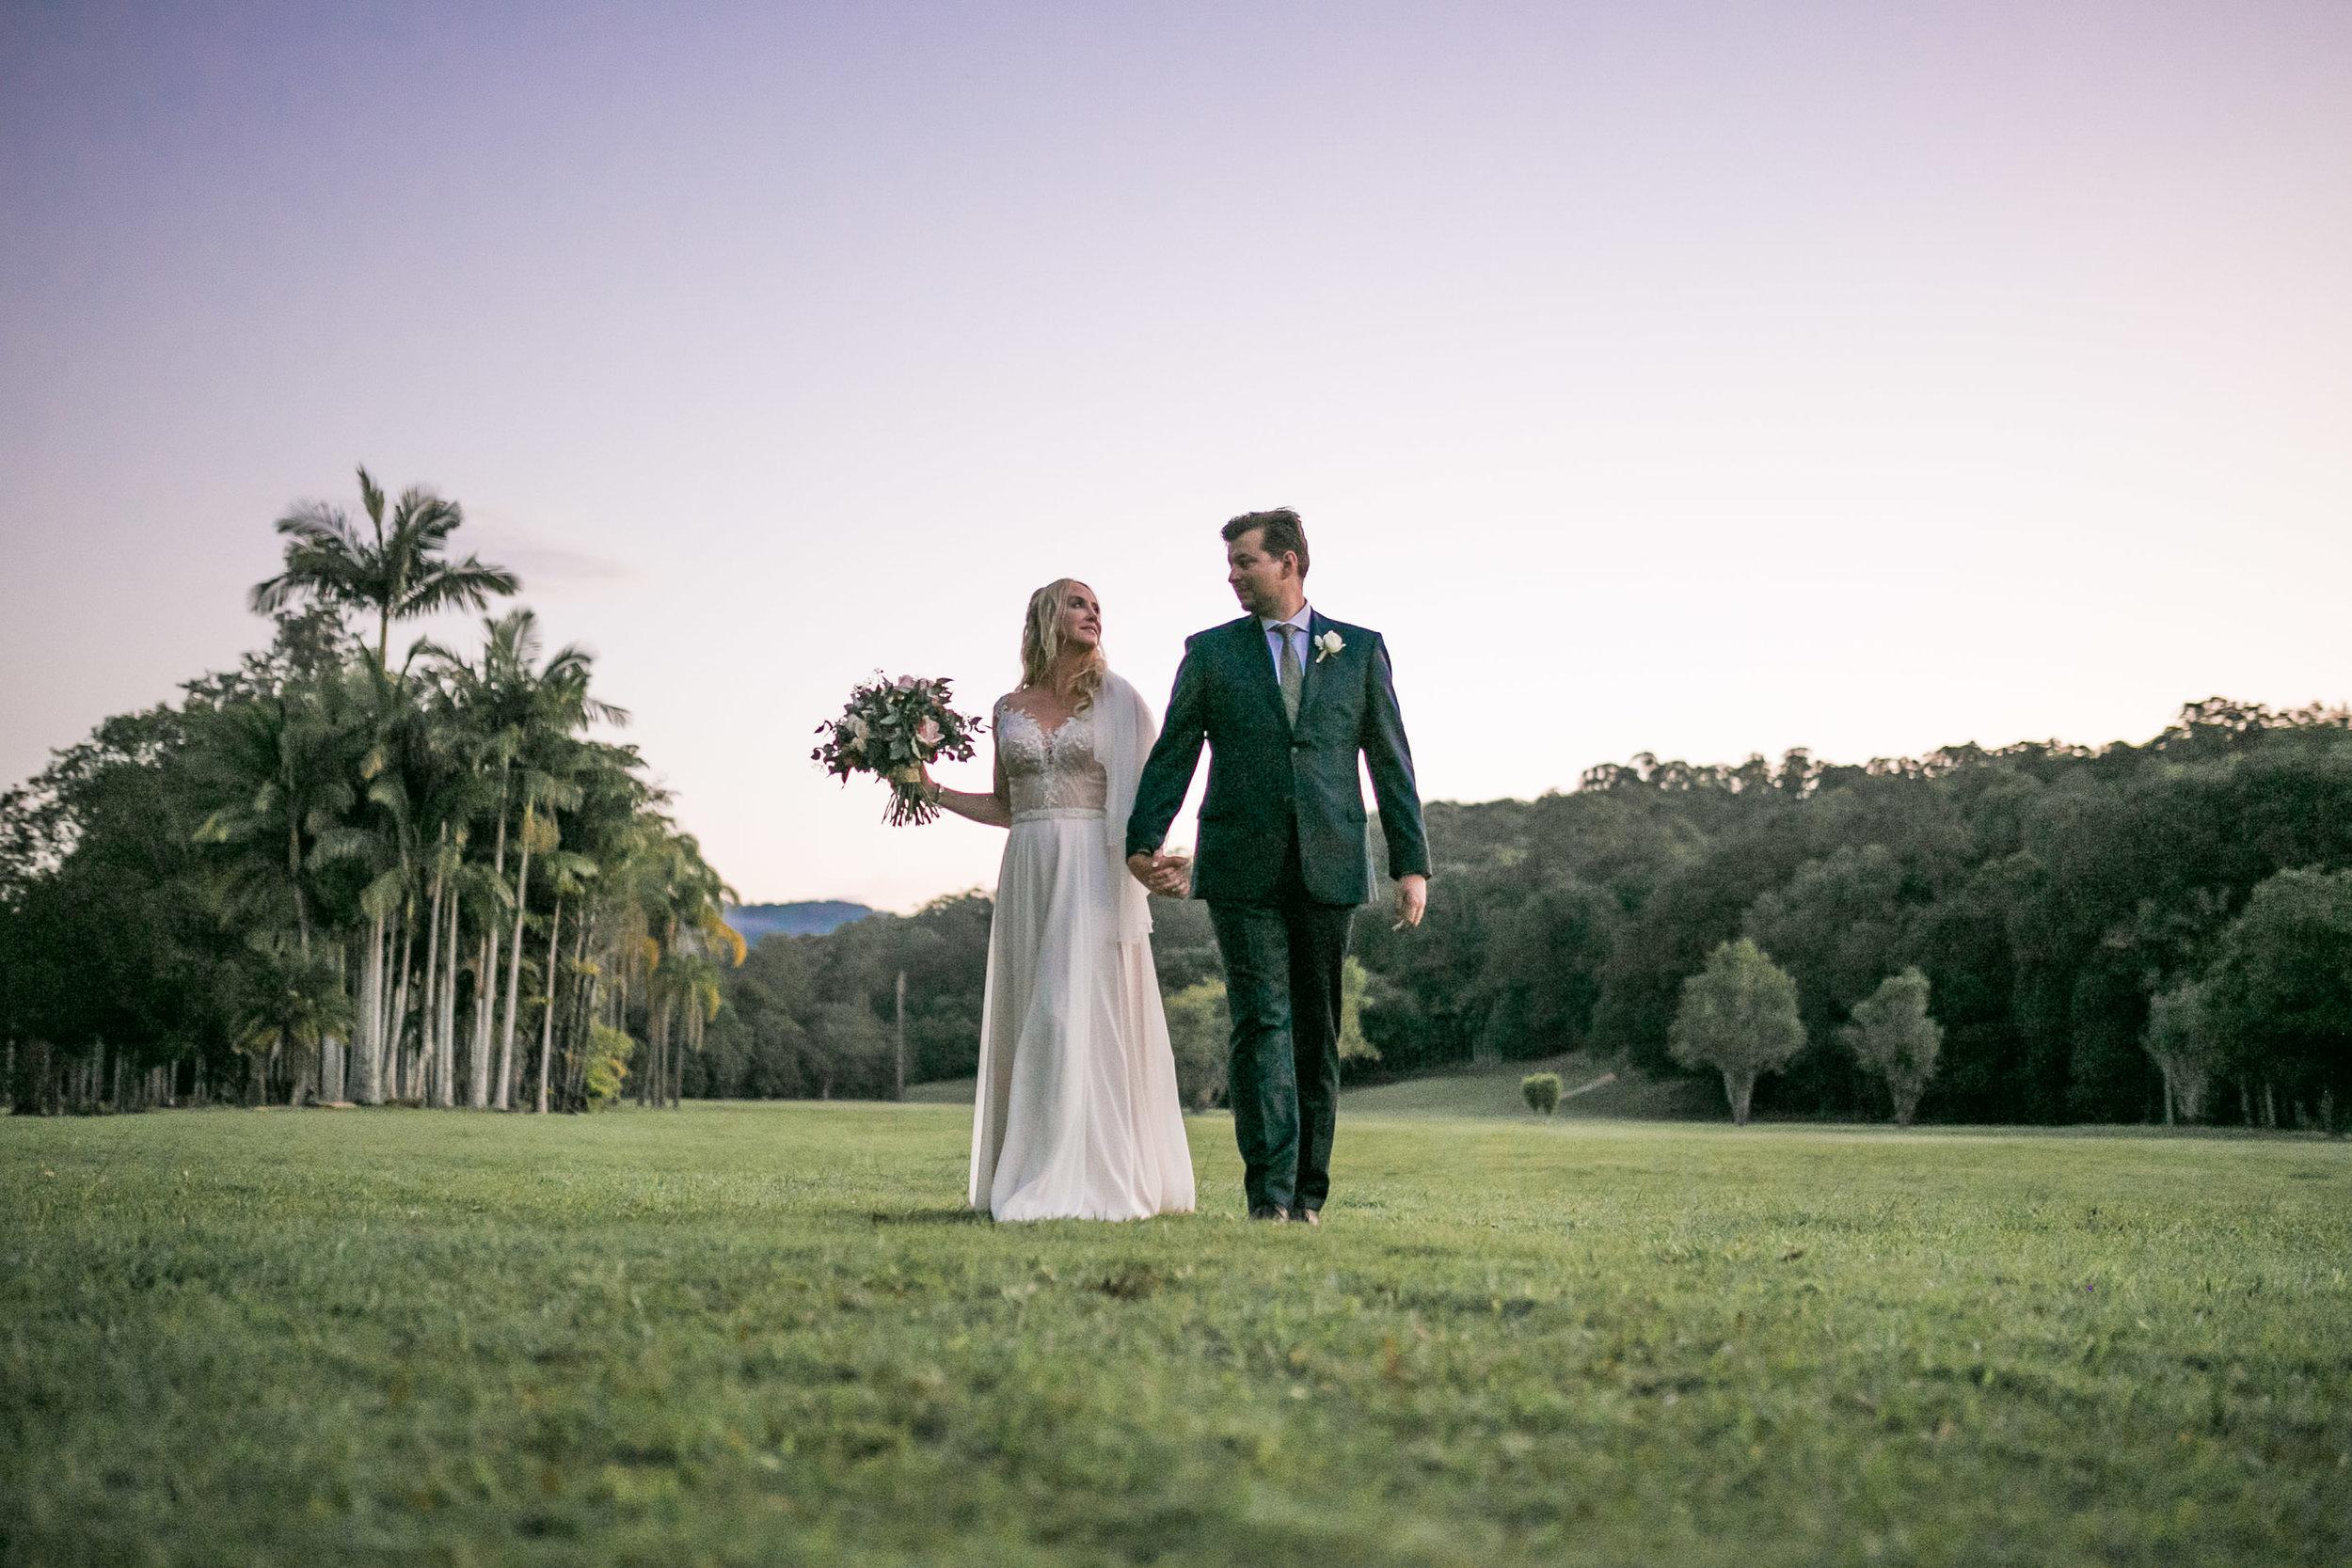 True North Photography_Boomerang Farm_Stacey and Isaac_Gold Coast Wedding_Barm Wedding_Hinterland Wedding-179.jpg